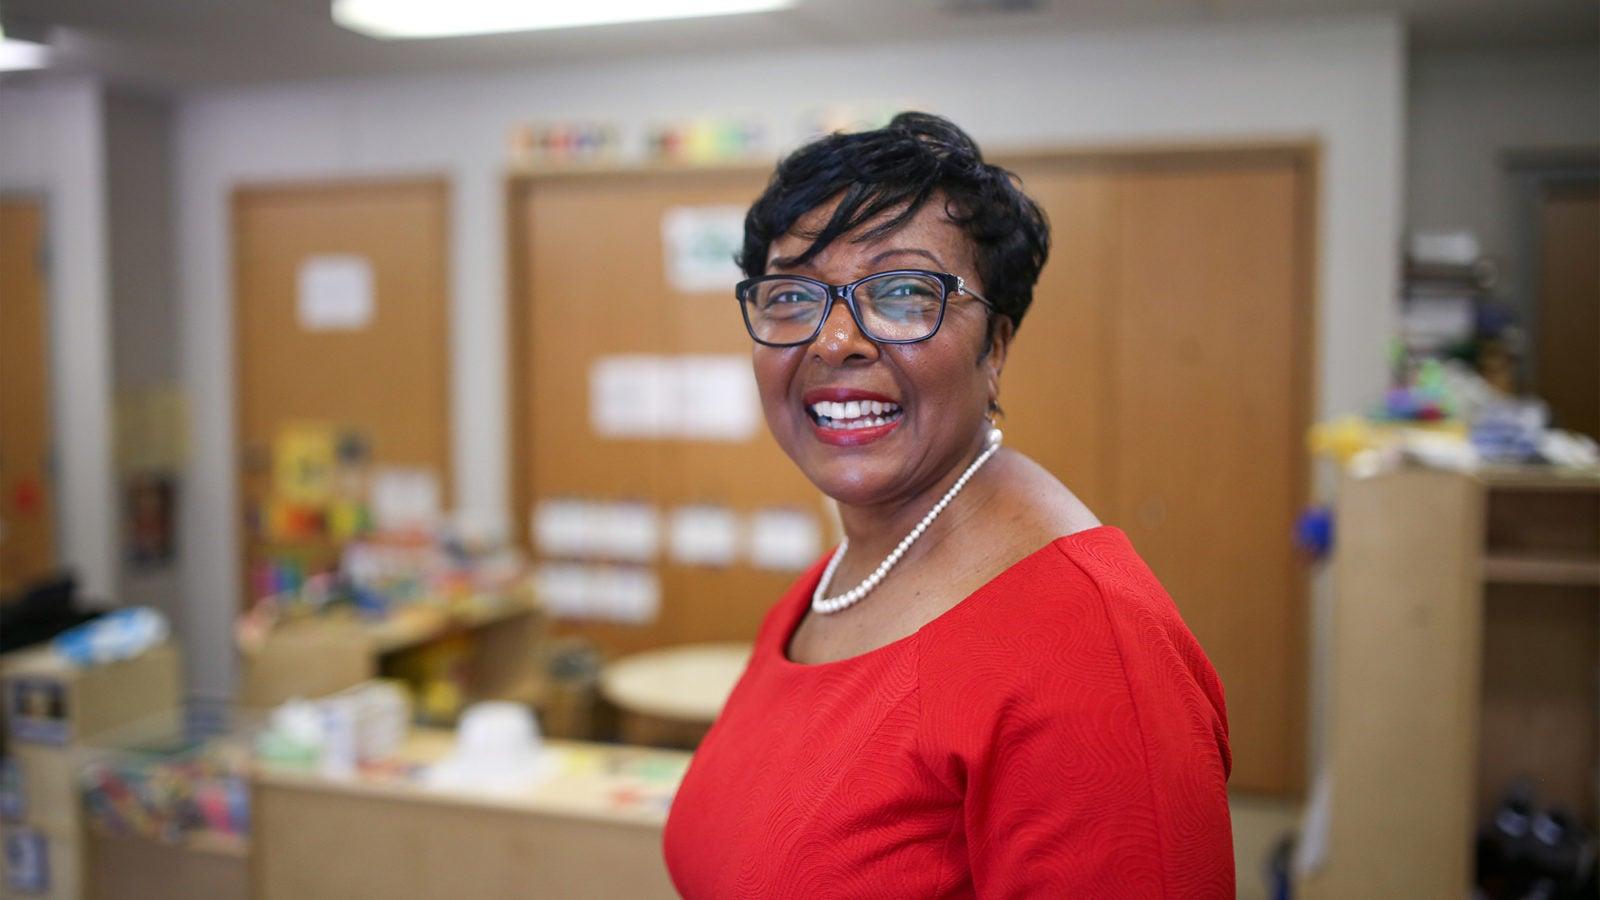 Sandra Jackson standing in front of some desks